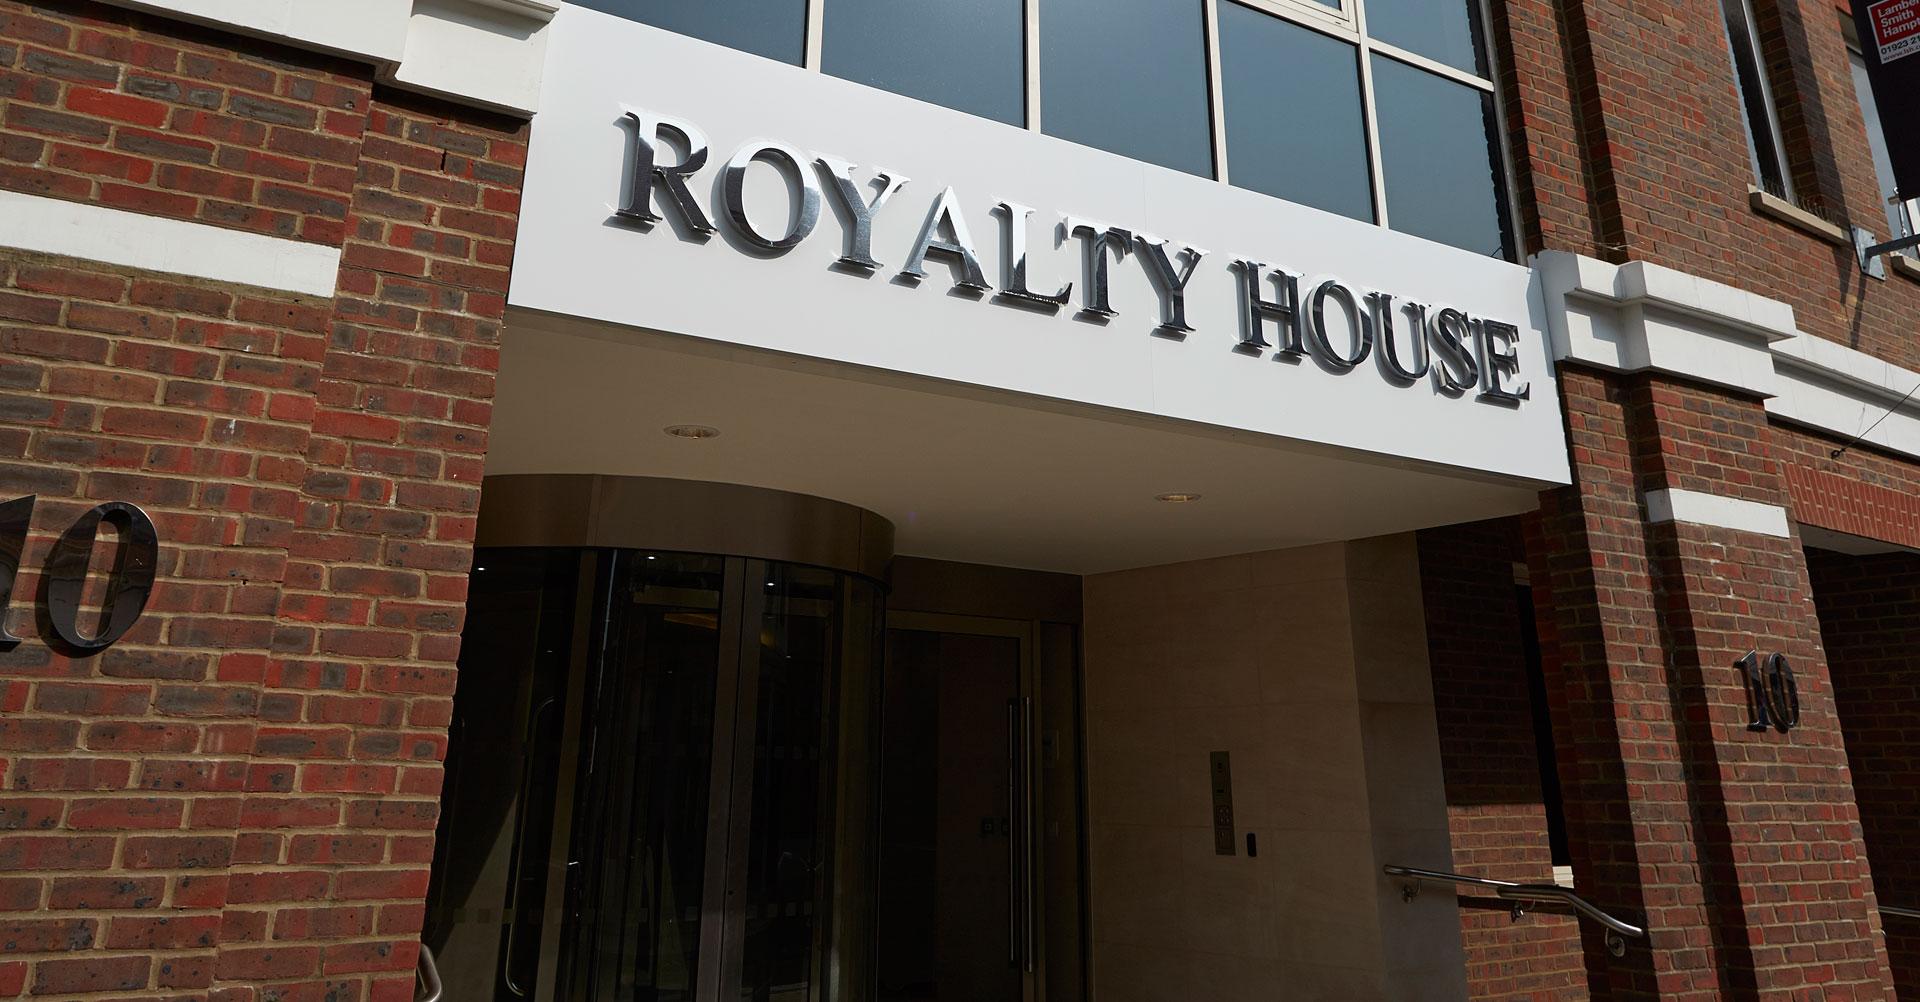 royalty-house-1